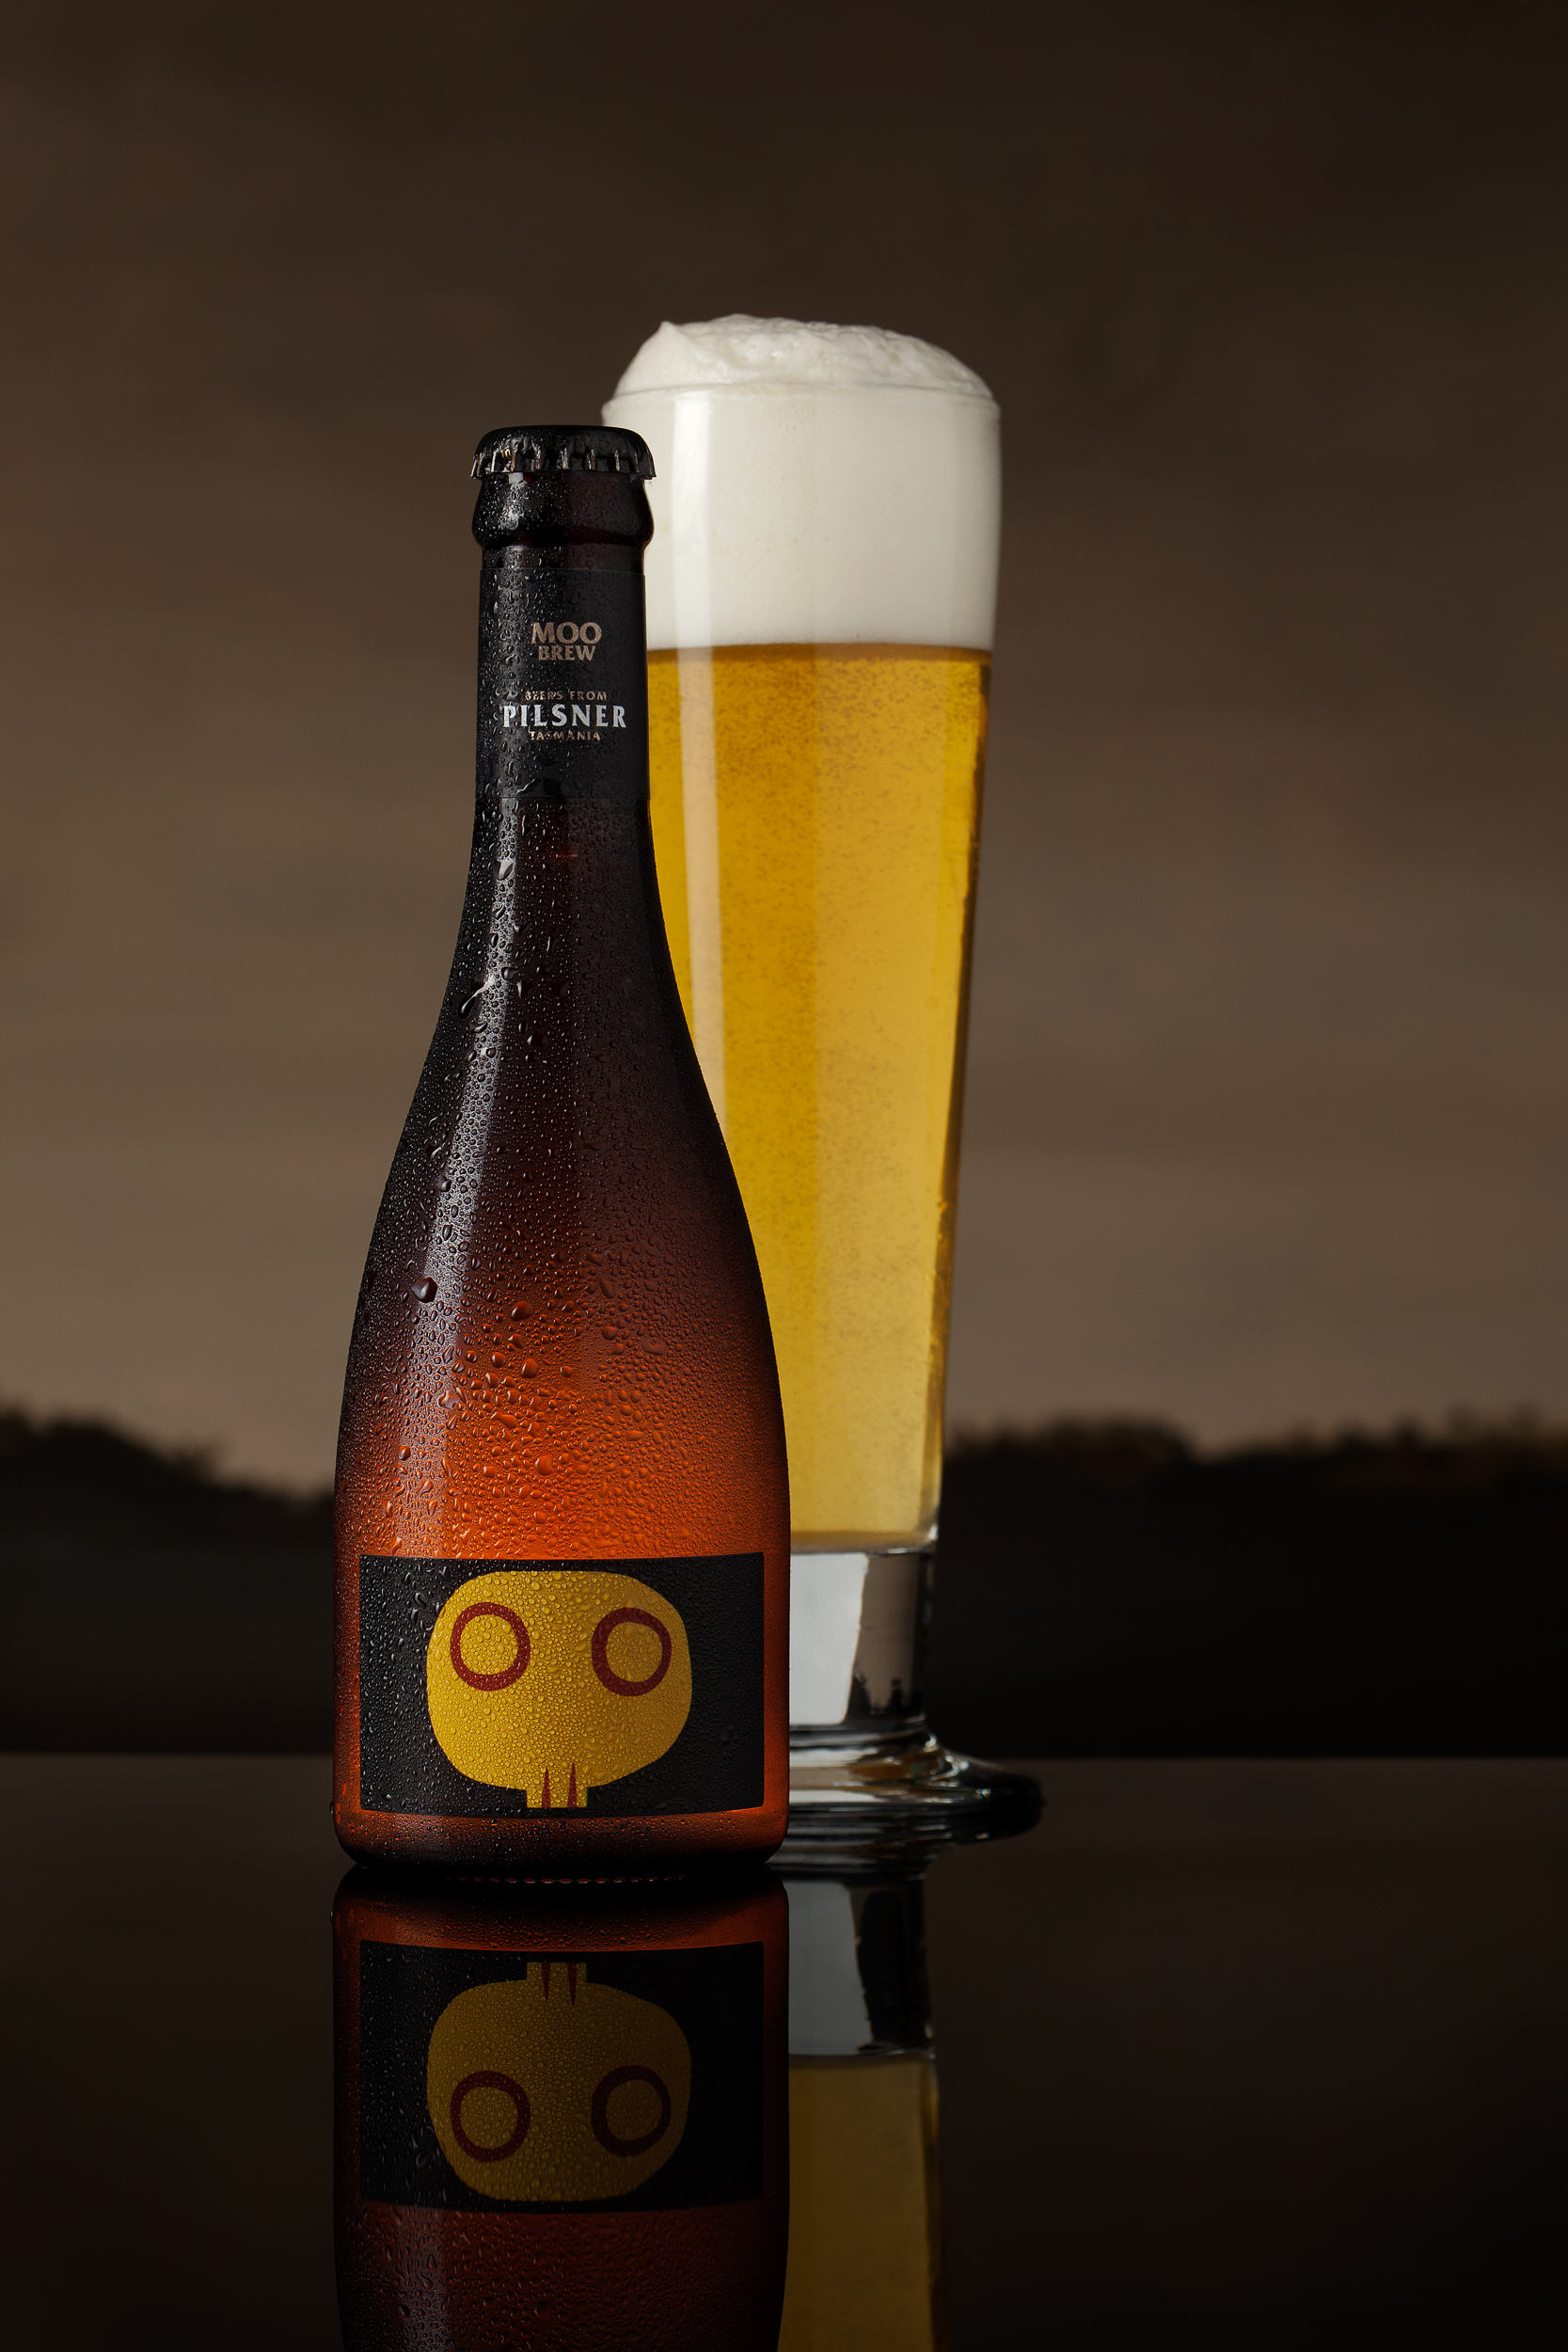 Branding hero image of the Moo Brew pilsner